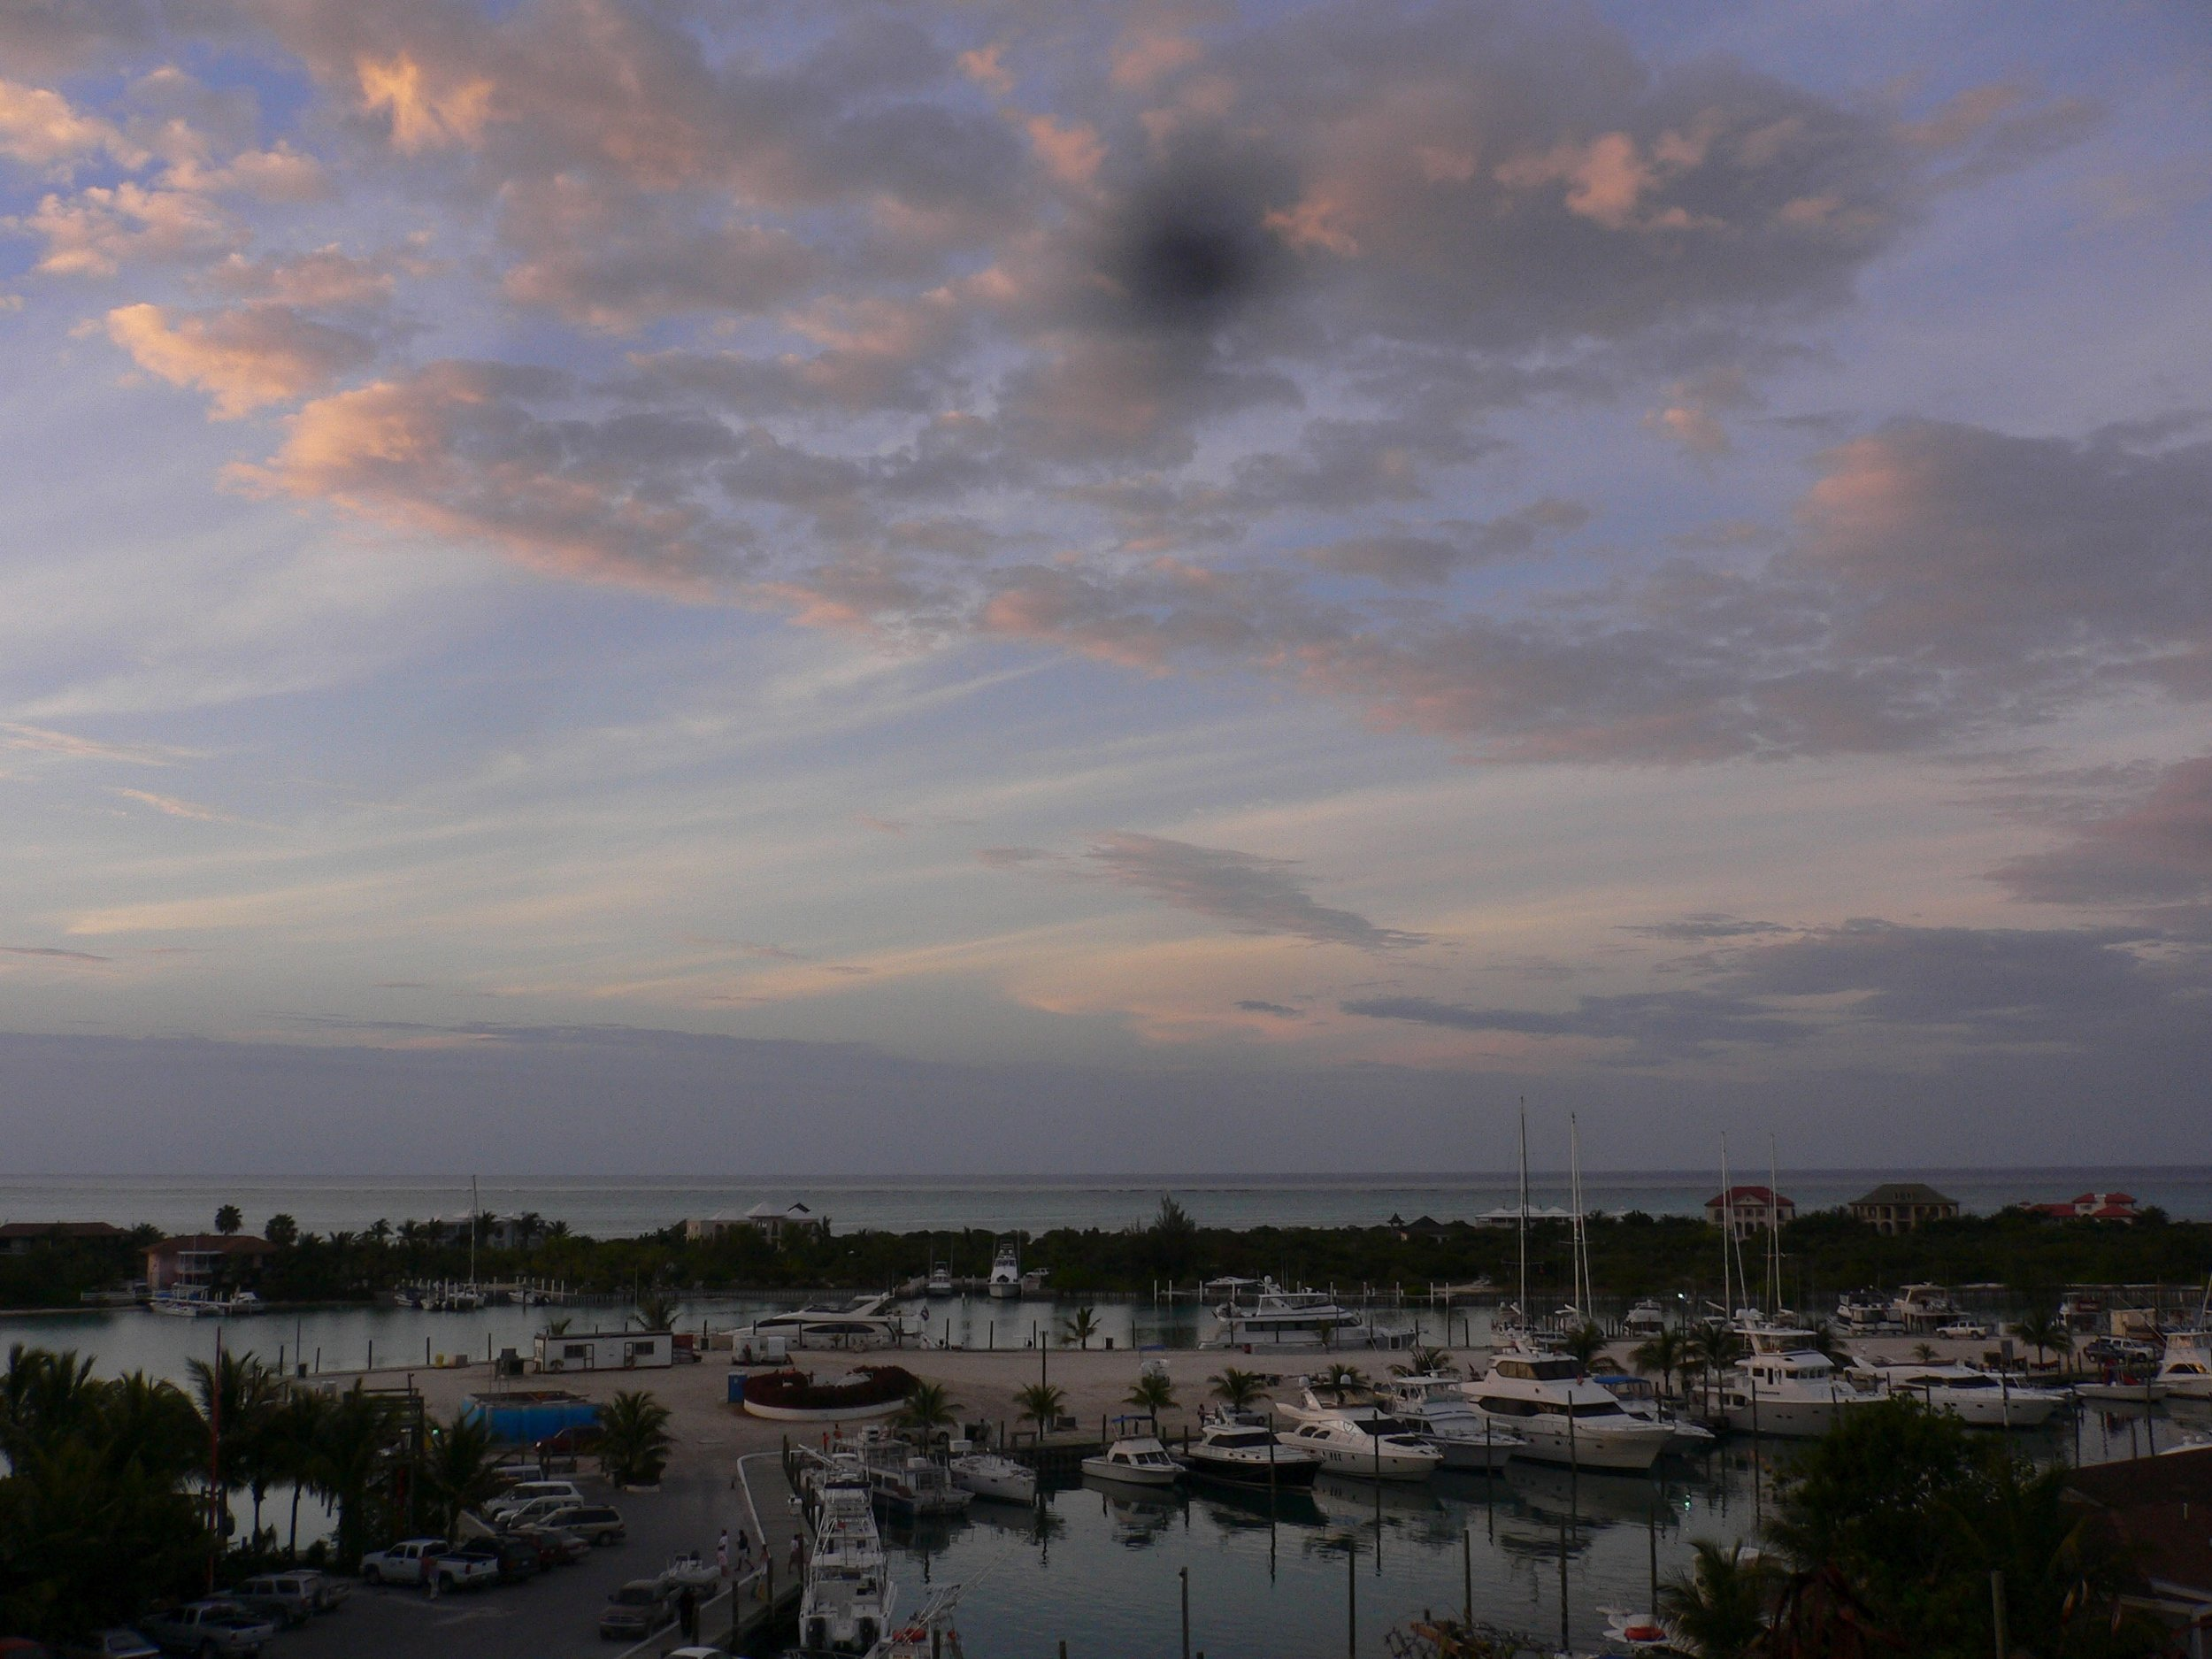 Turks_and_Caicos_Islands_sunset.jpg